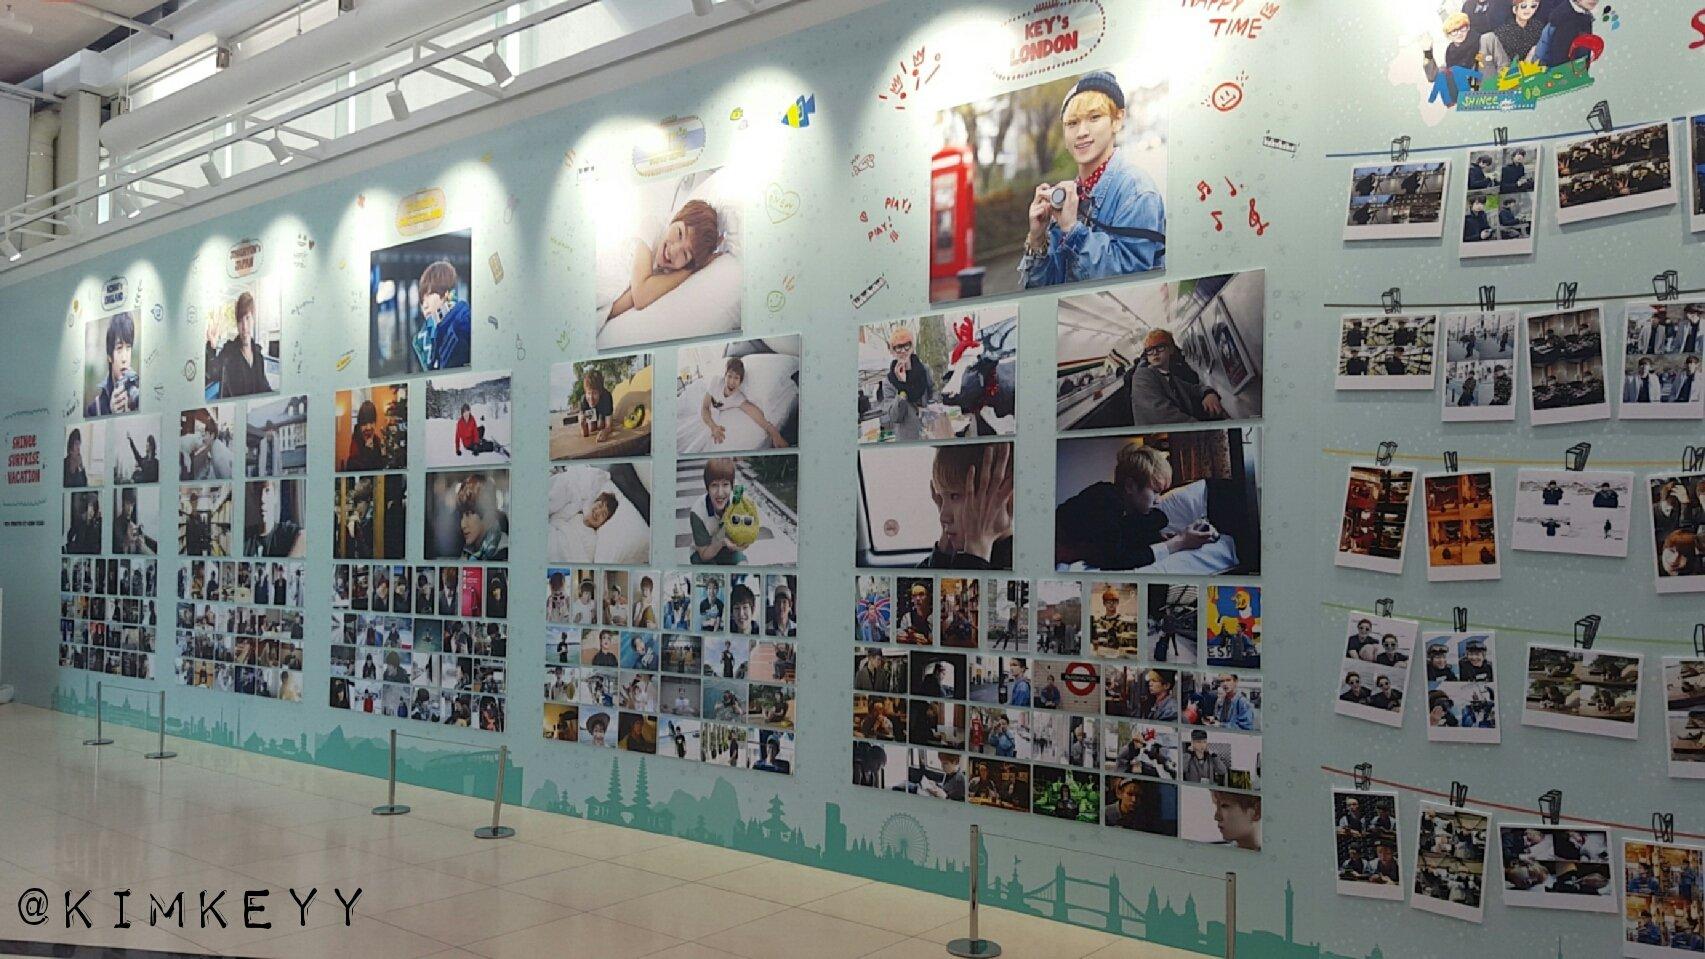 SHINee @ SHINee Surprise Vacation Exhibition 25310885145_7568175907_o